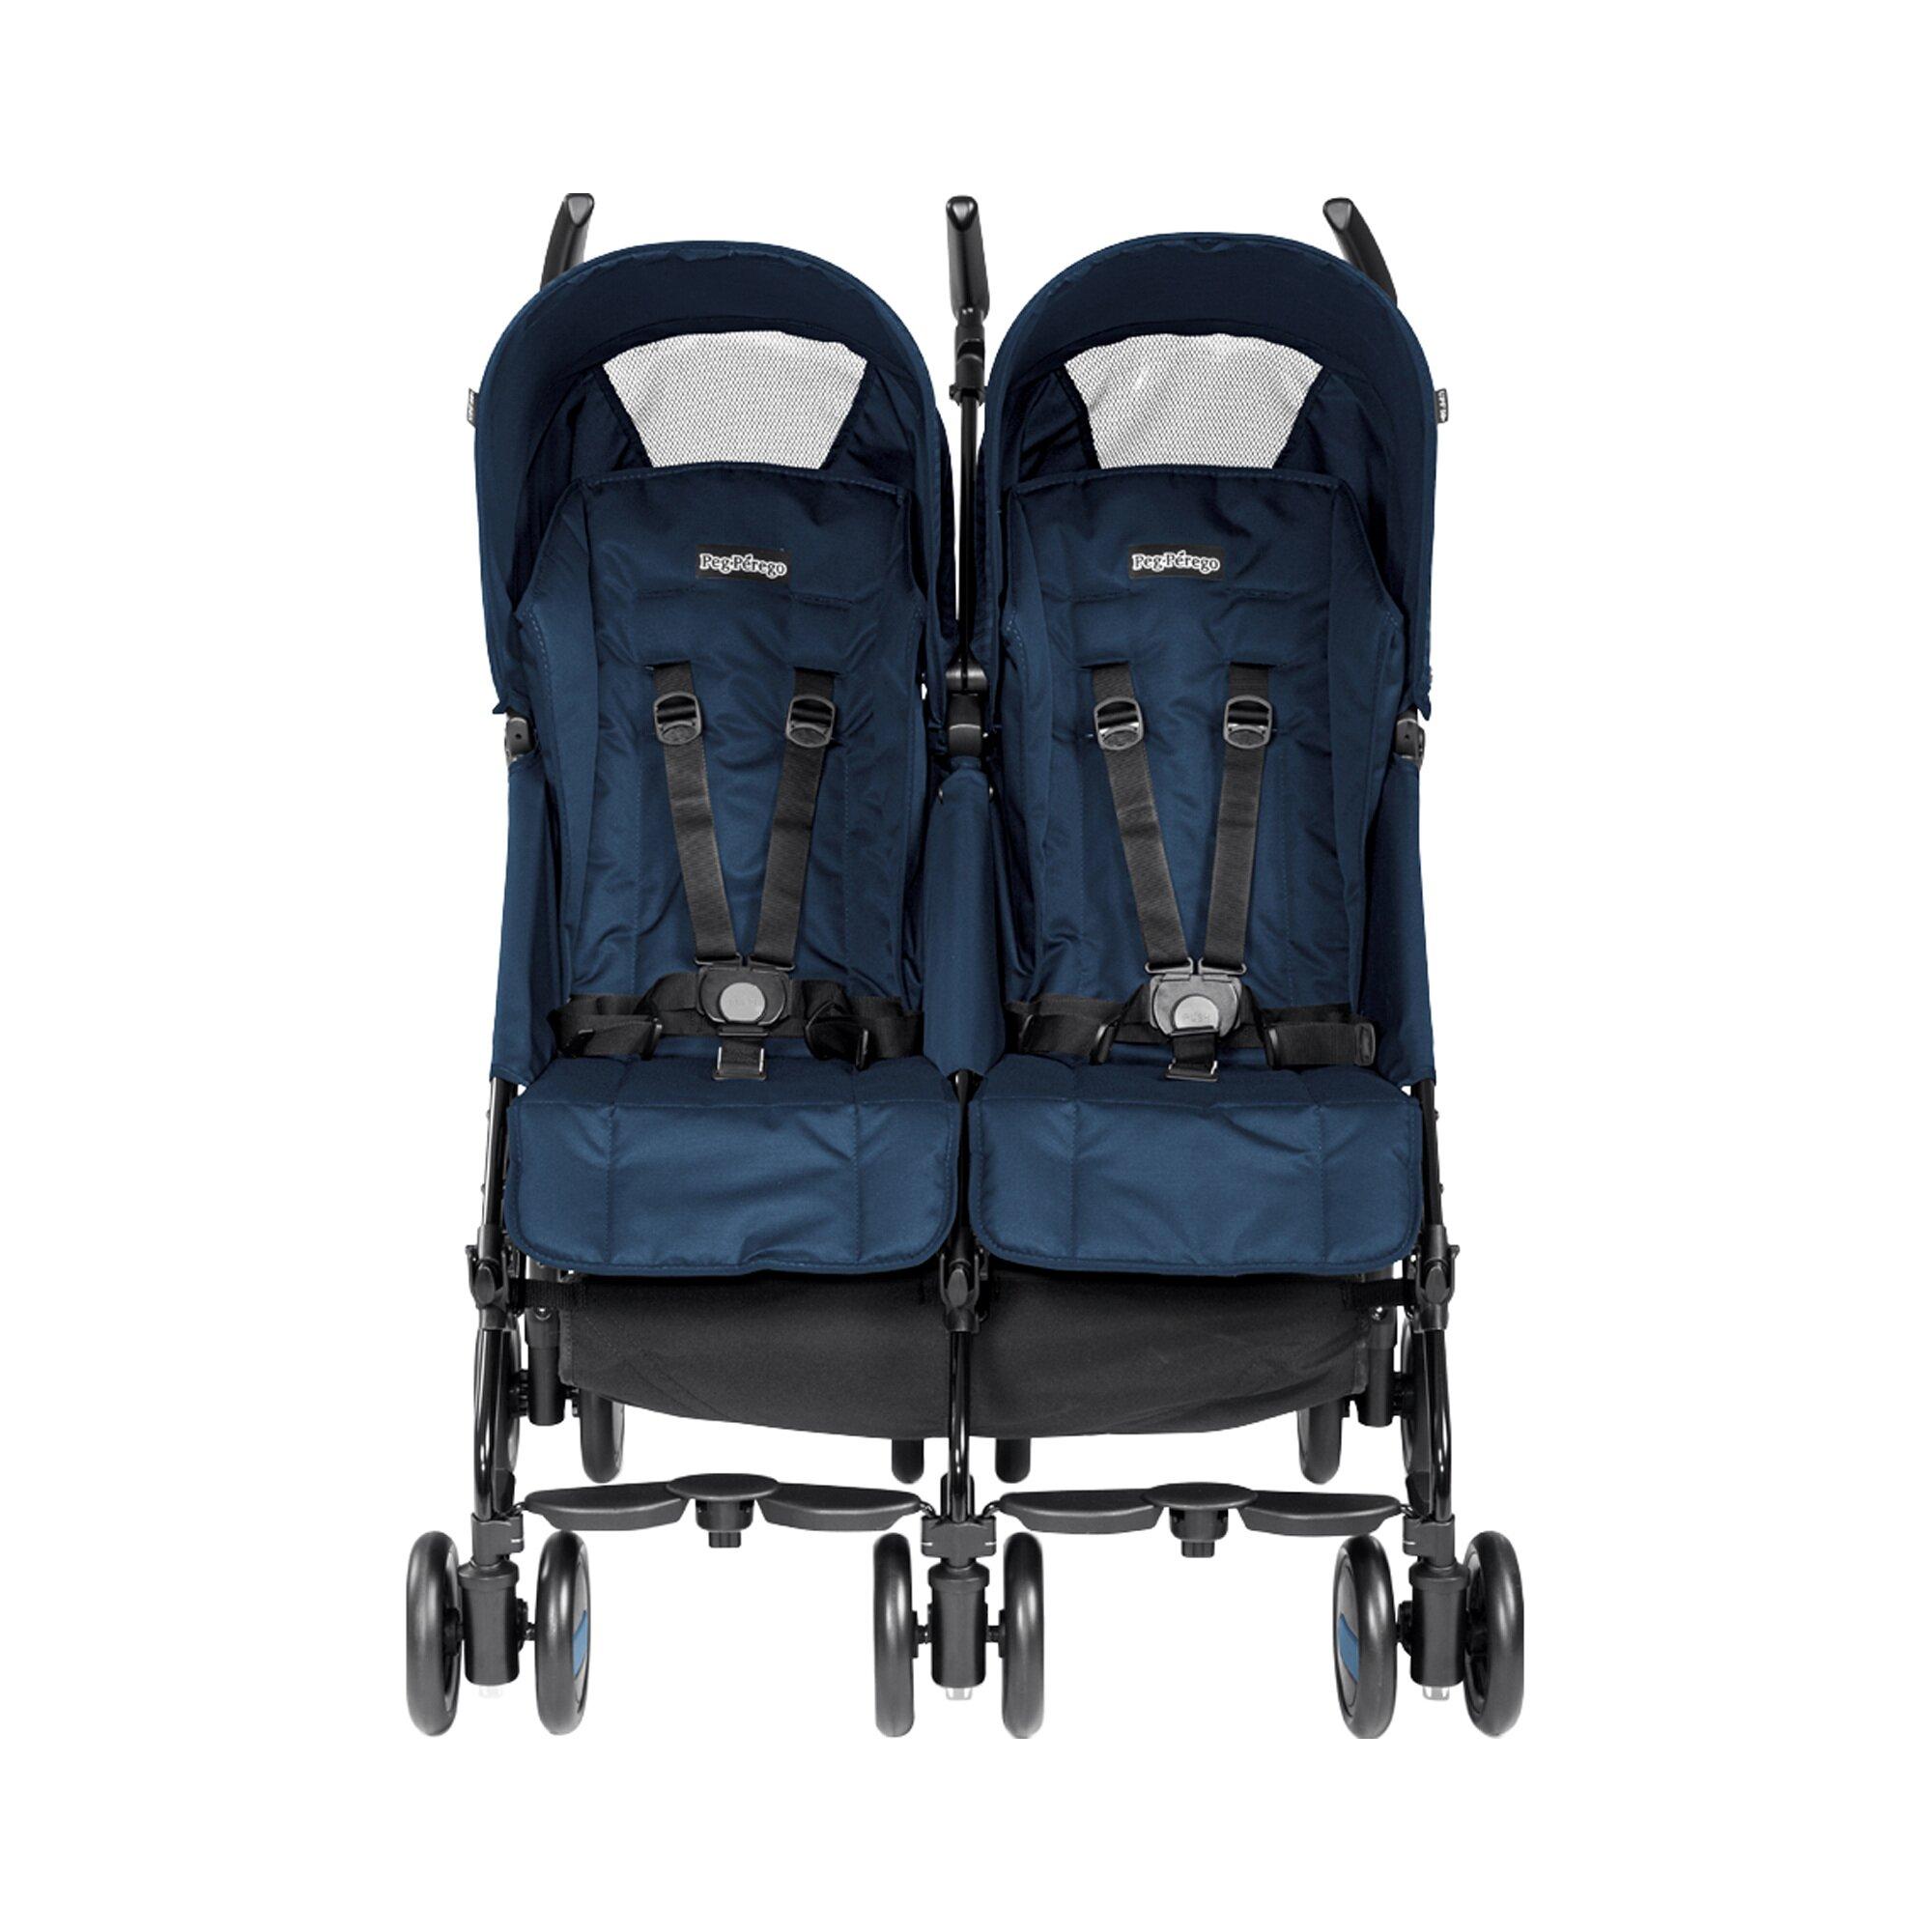 peg-perego-pliko-mini-zwillingsbuggy-mit-liegefunktion-blau